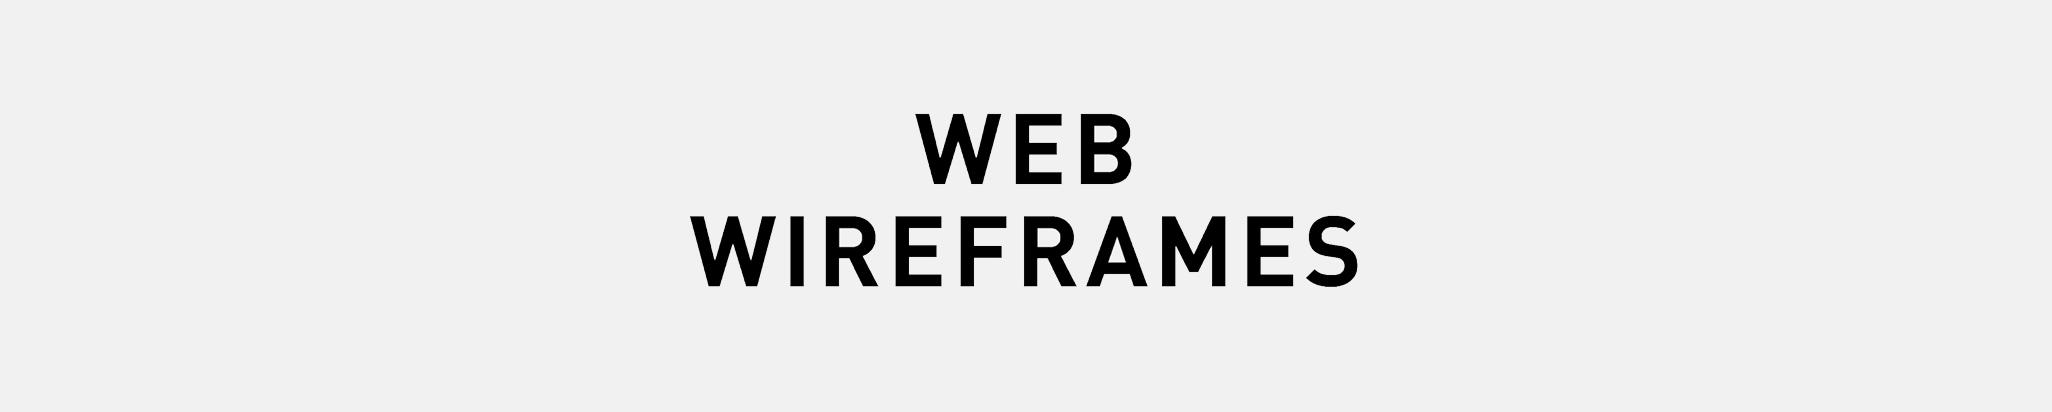 web wireframes.jpg